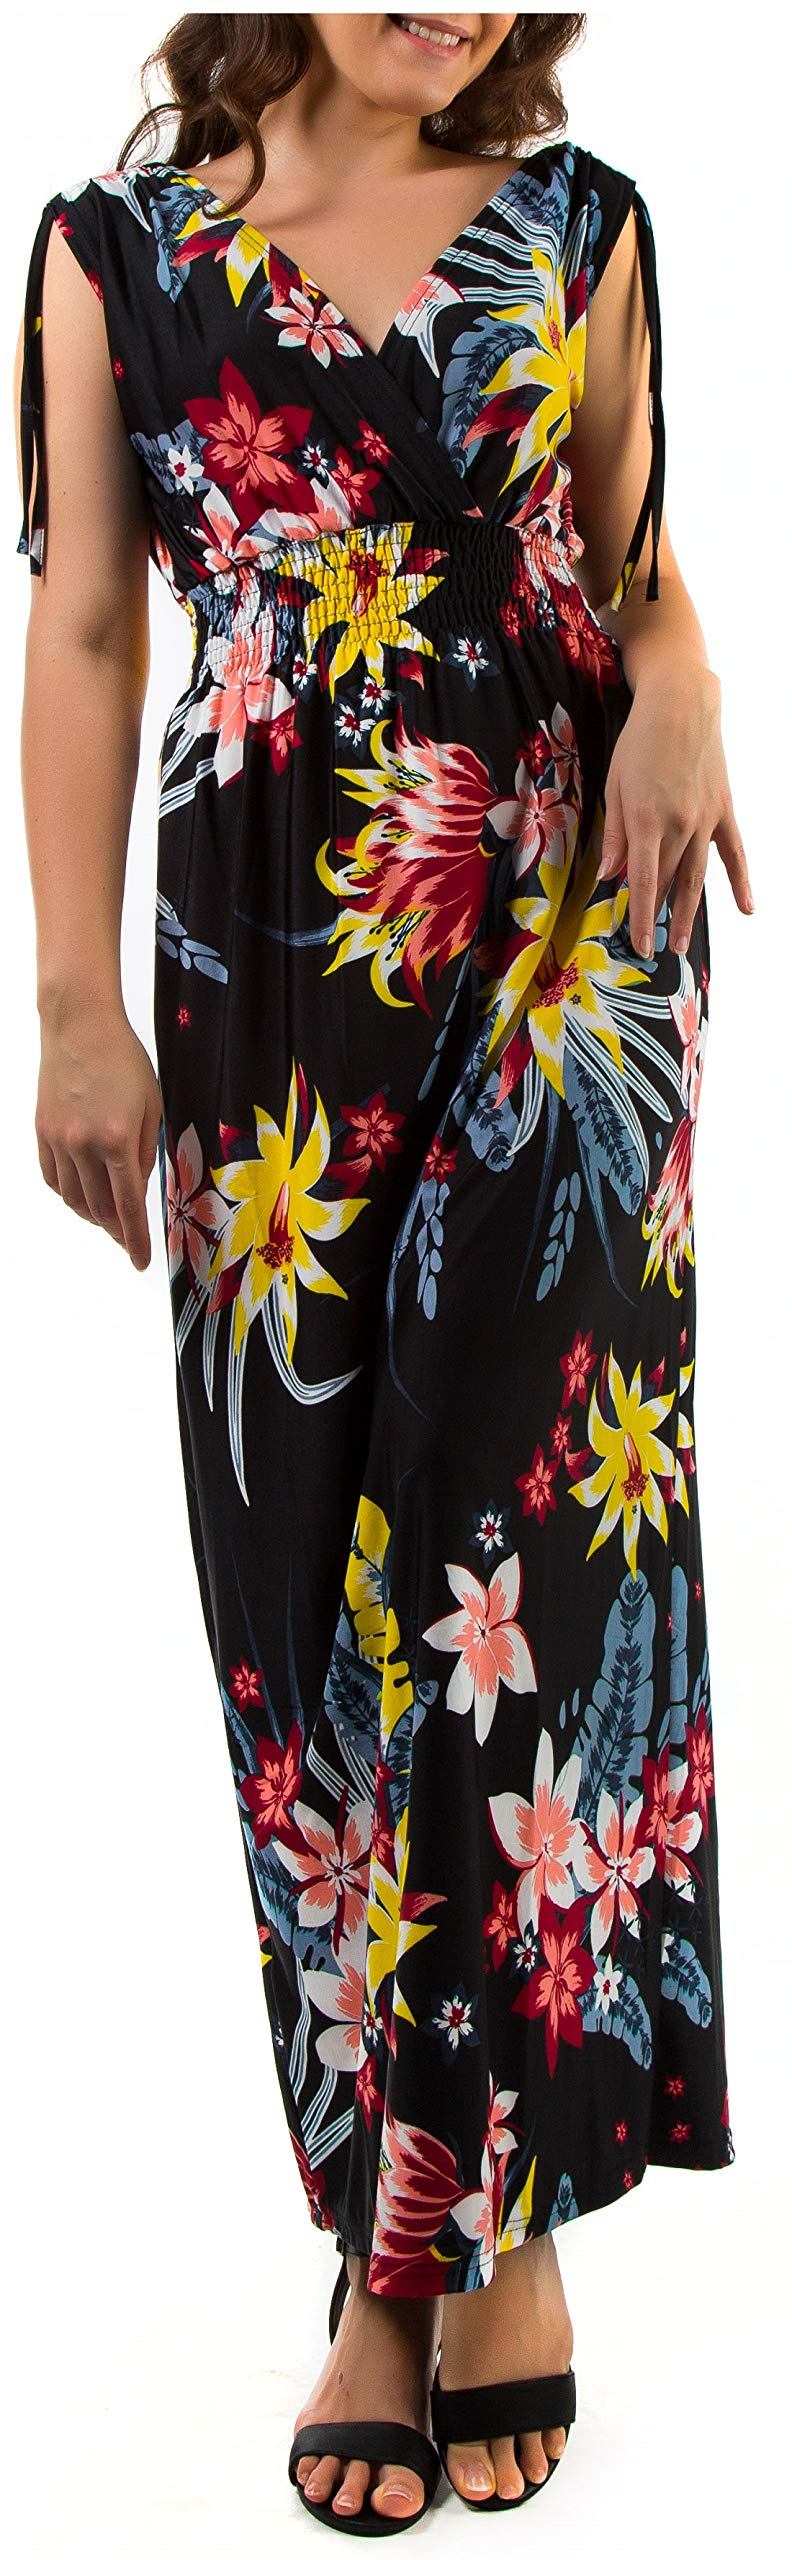 373d27ef24ab3 Home/Maxi dresses/Mia Suri Summer Ladies Floral Print Beach Casual Holiday  Maxi Day Dress. ; 